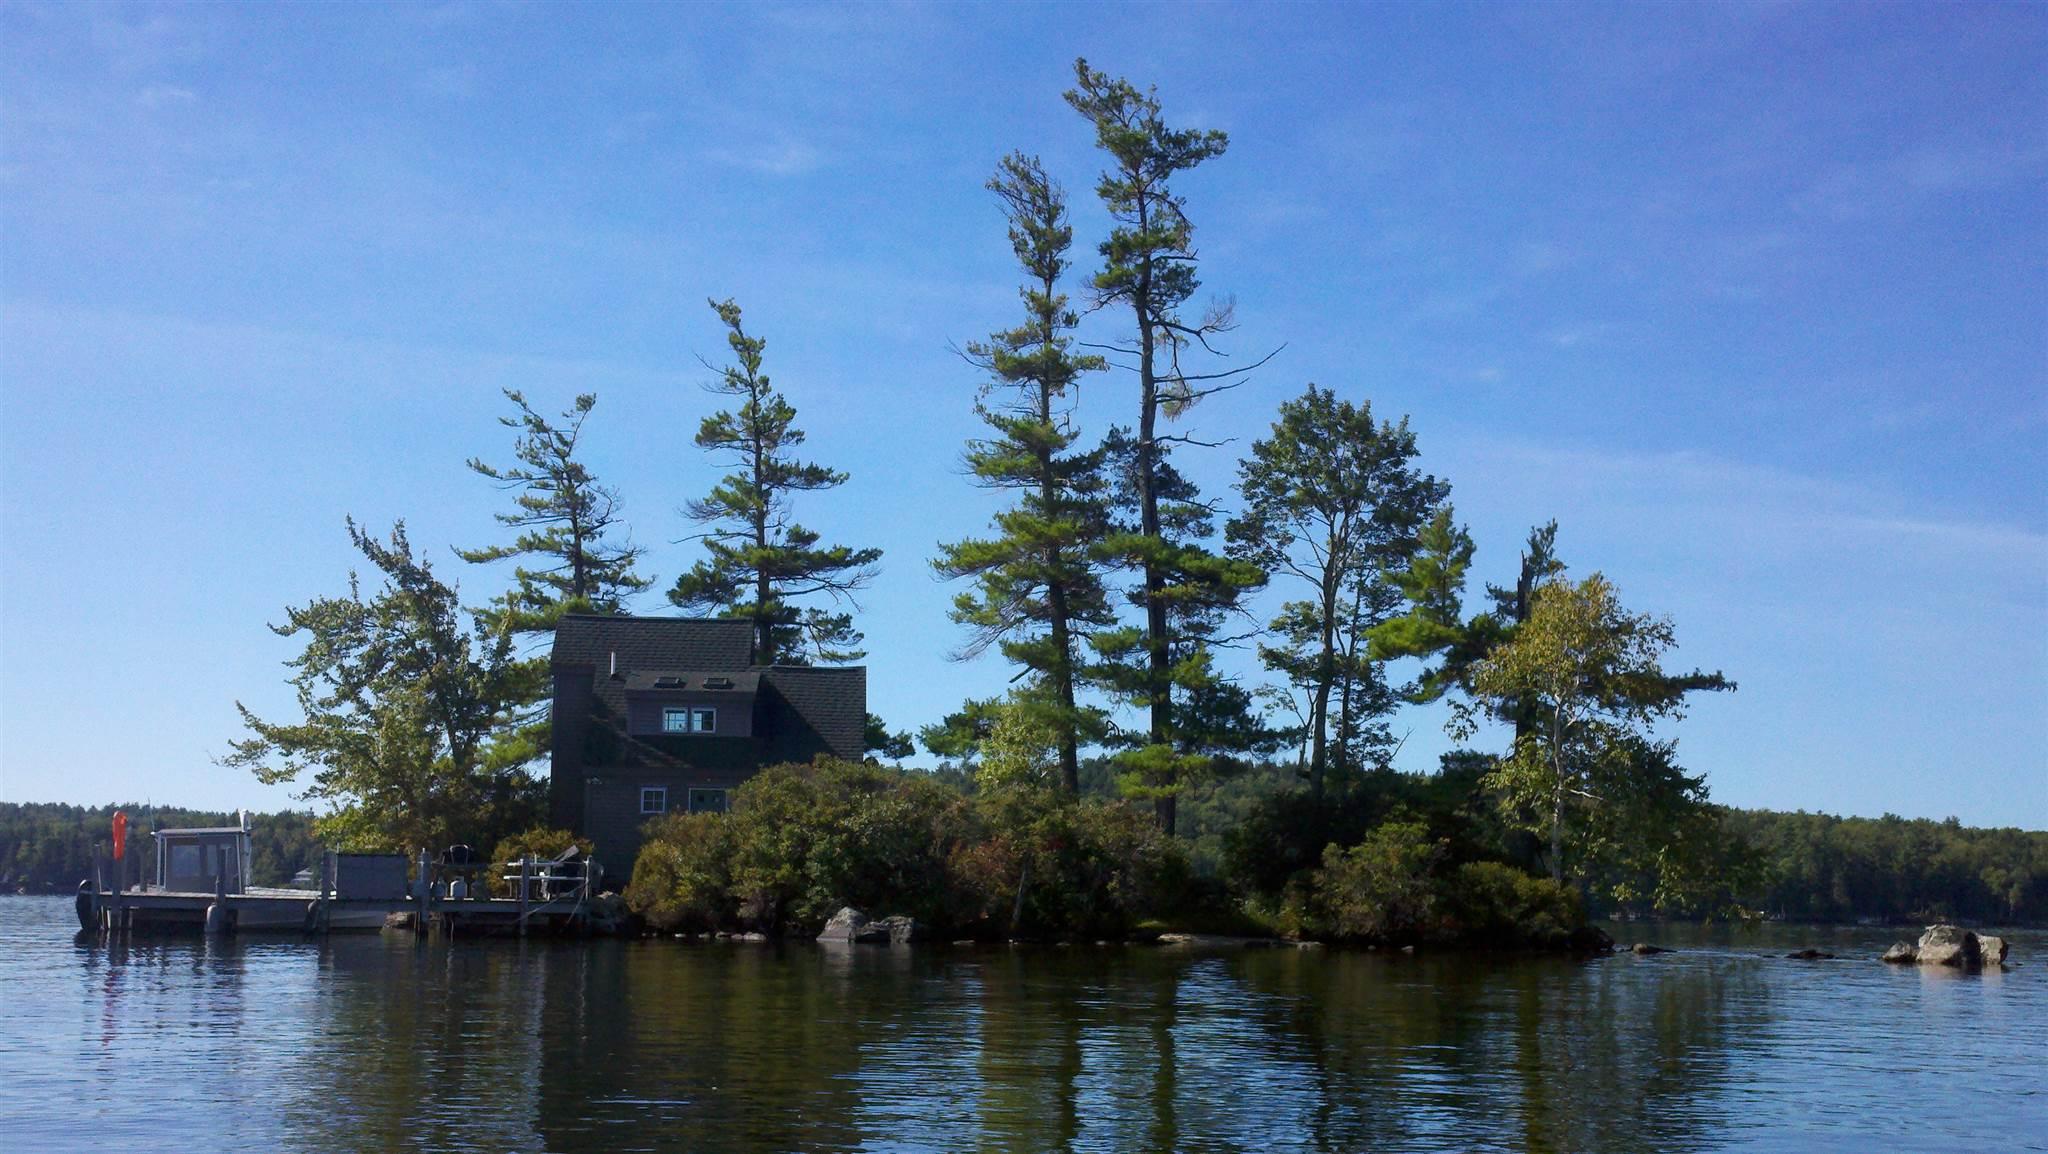 Photo of 1 Tip Island Tuftonboro NH 03816